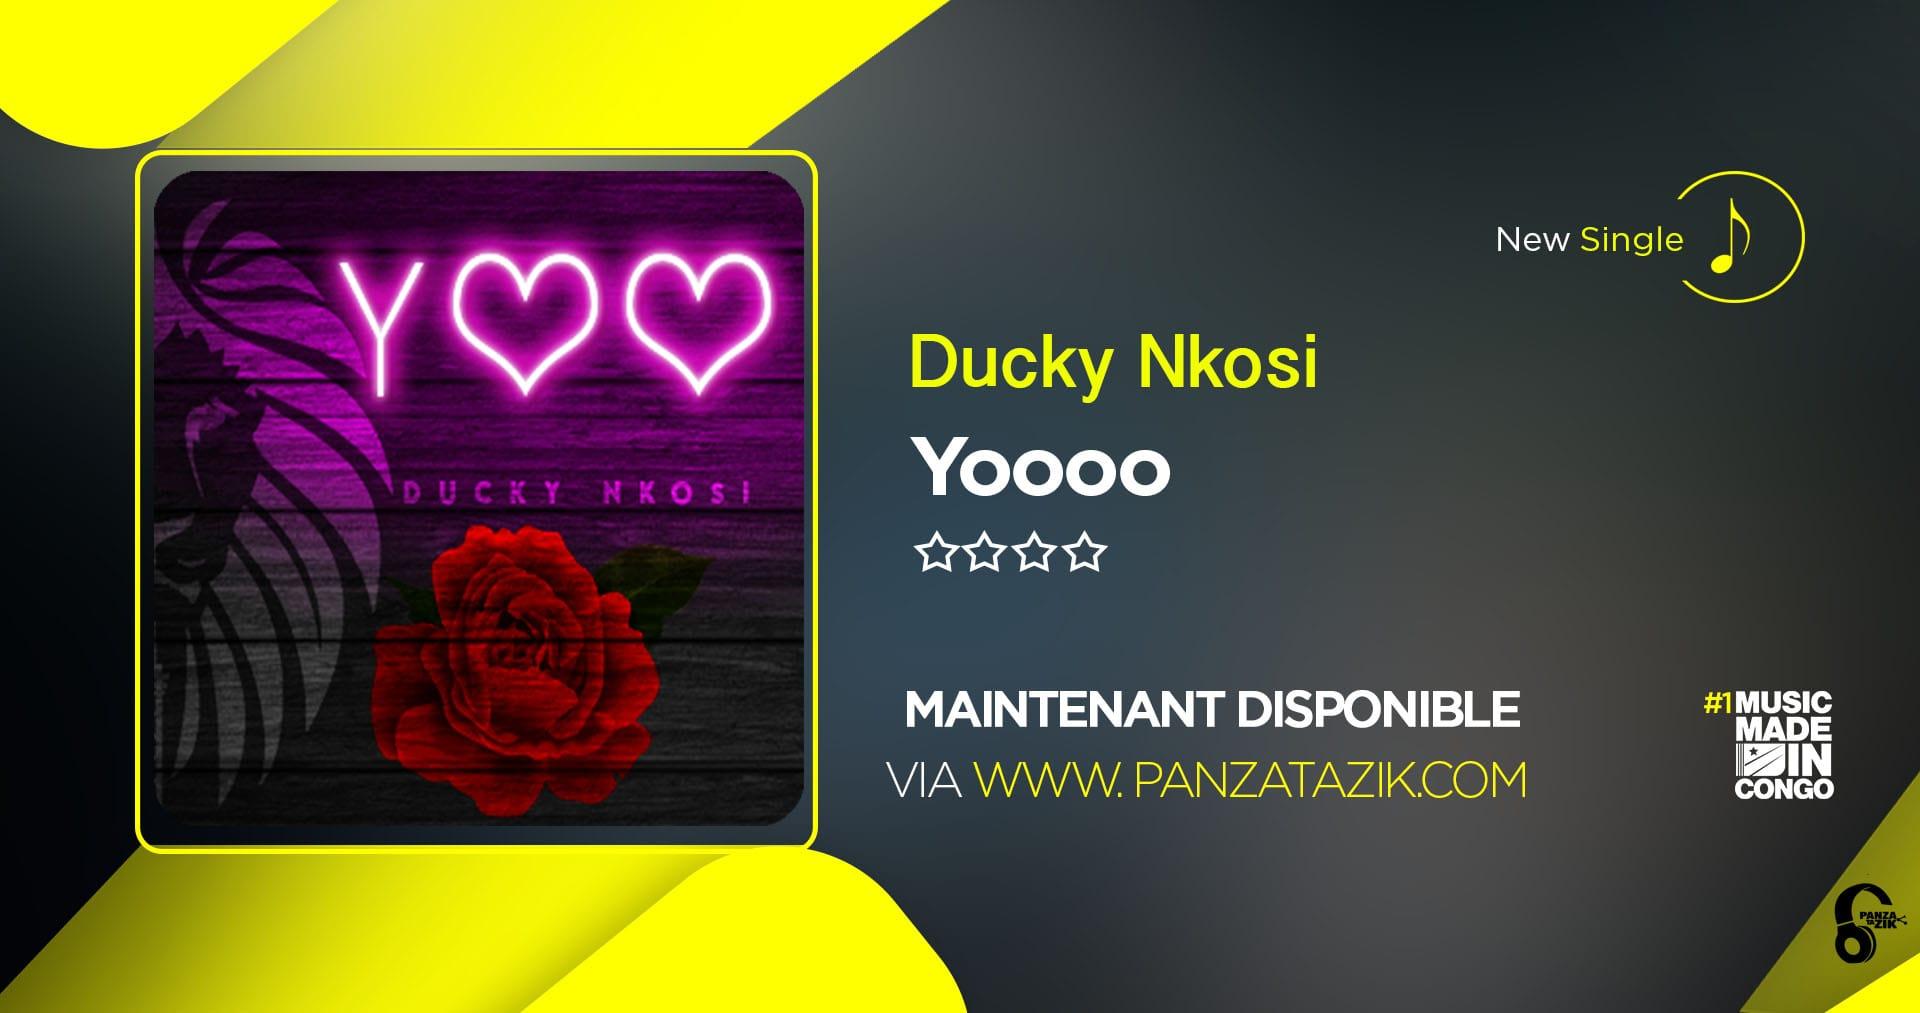 «Ducky Nkosi» offre un avant-goût de son nouvel album avec le single «Yoooo»